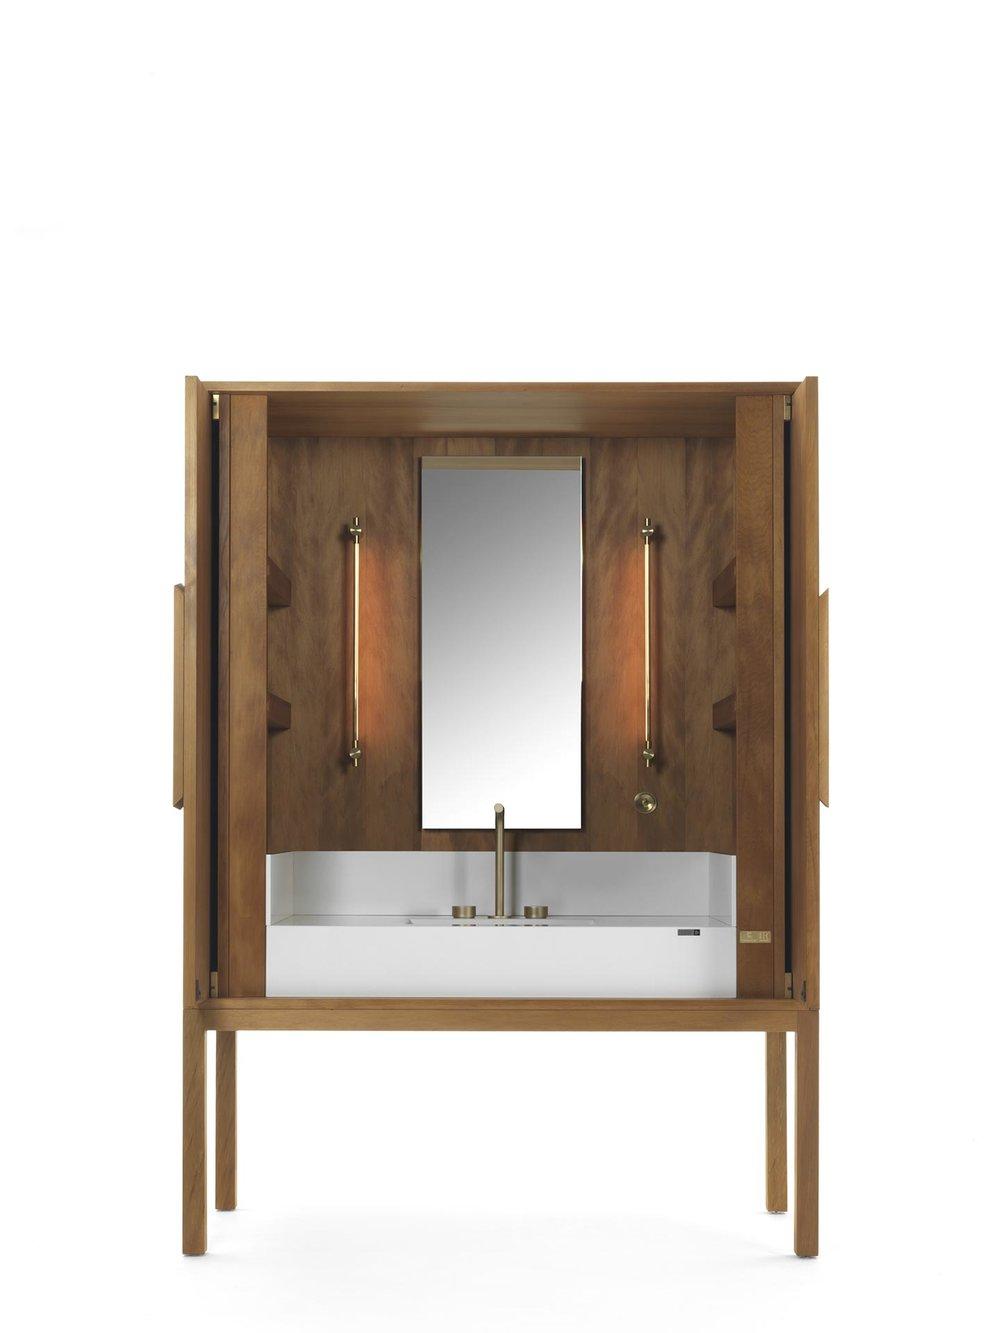 dekauri-vanity-riva-1920-daniel-germani-designs-3.jpg